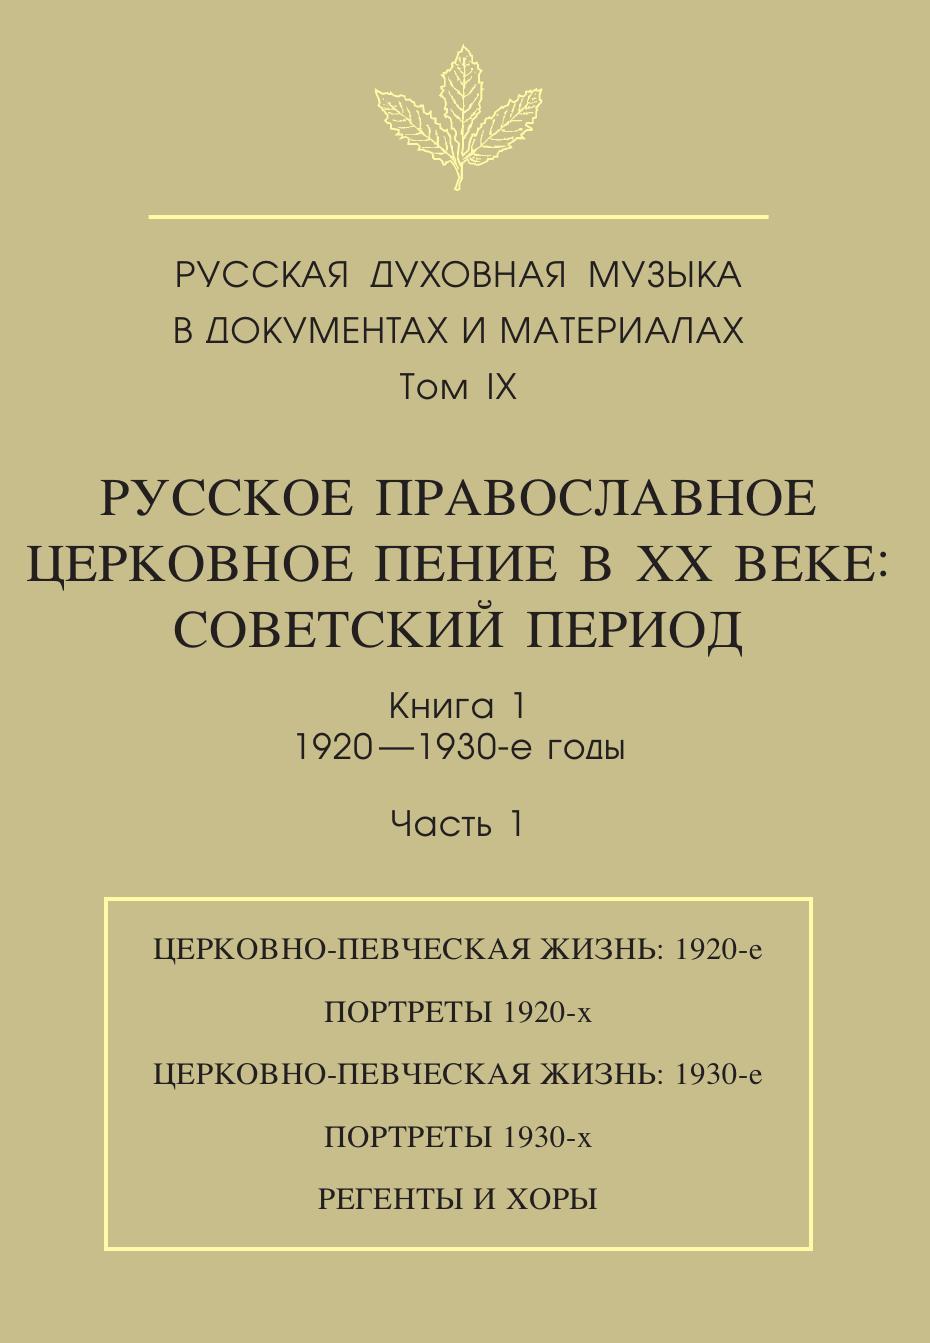 Russkaya-duhovnaya-muzyka-v-dokumentah-i-materialah-Tom-9-Russkoe-pravoslavnoe-cerkovnoe-penie-v-XX-veke-Sovetskij-period-Kniga-1-1920-1930-e-gody-CHa